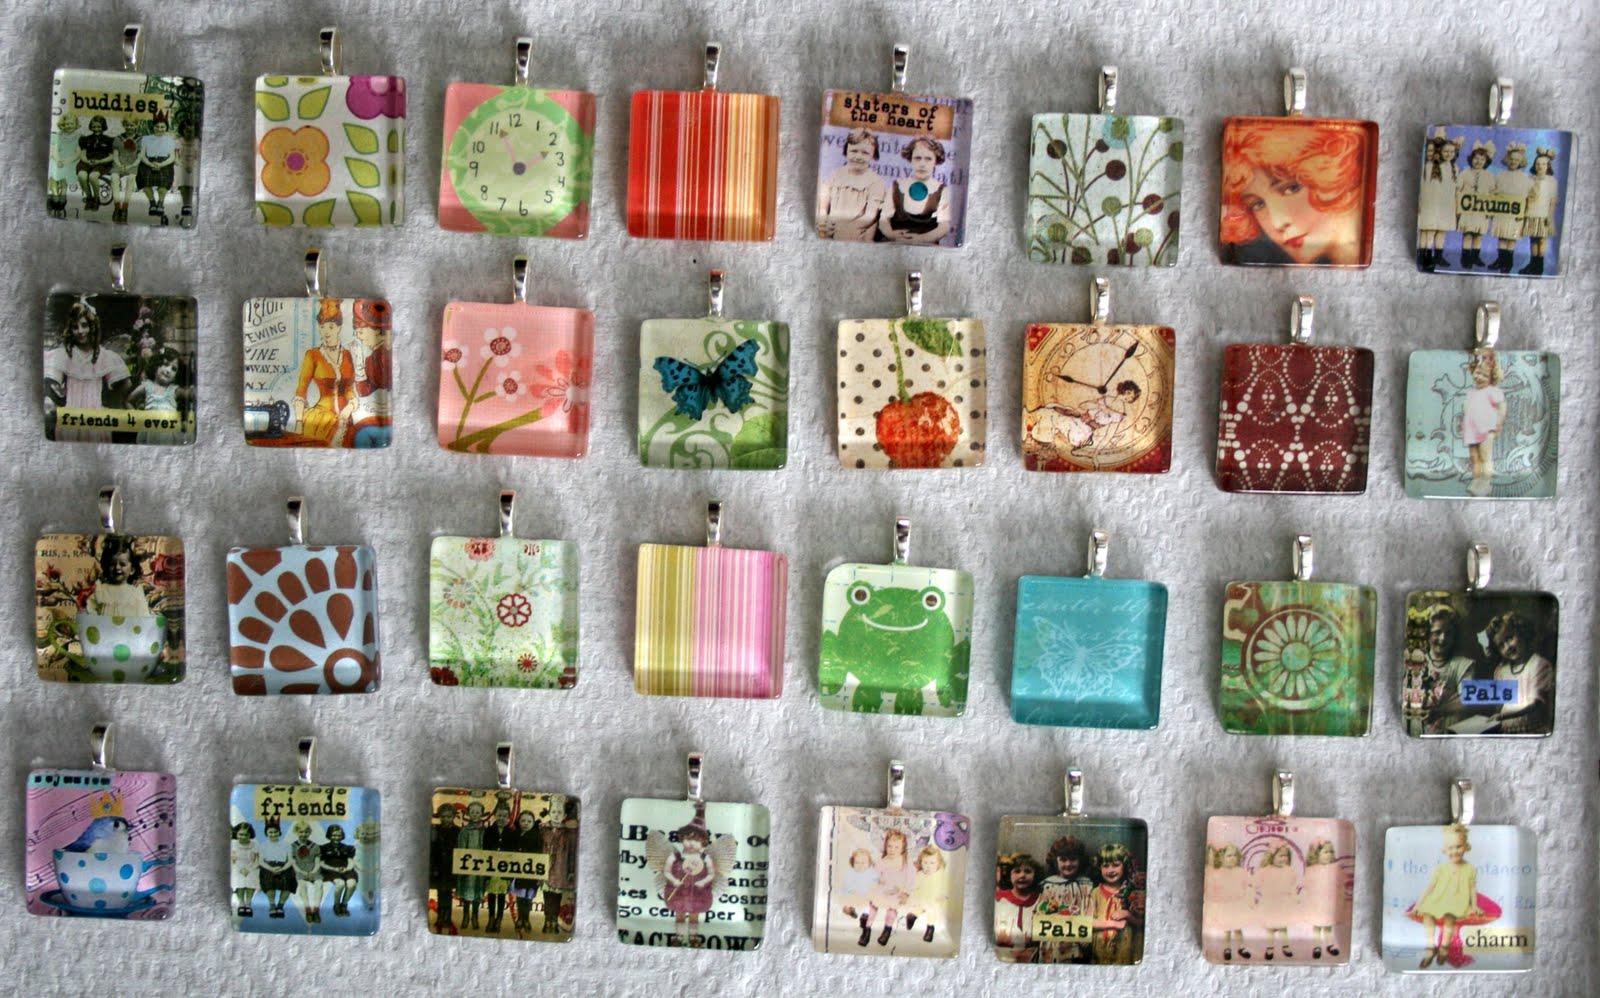 Tabithas trinkets glass pendants created for galway craft fair glass pendants created for galway craft fair aloadofball Gallery